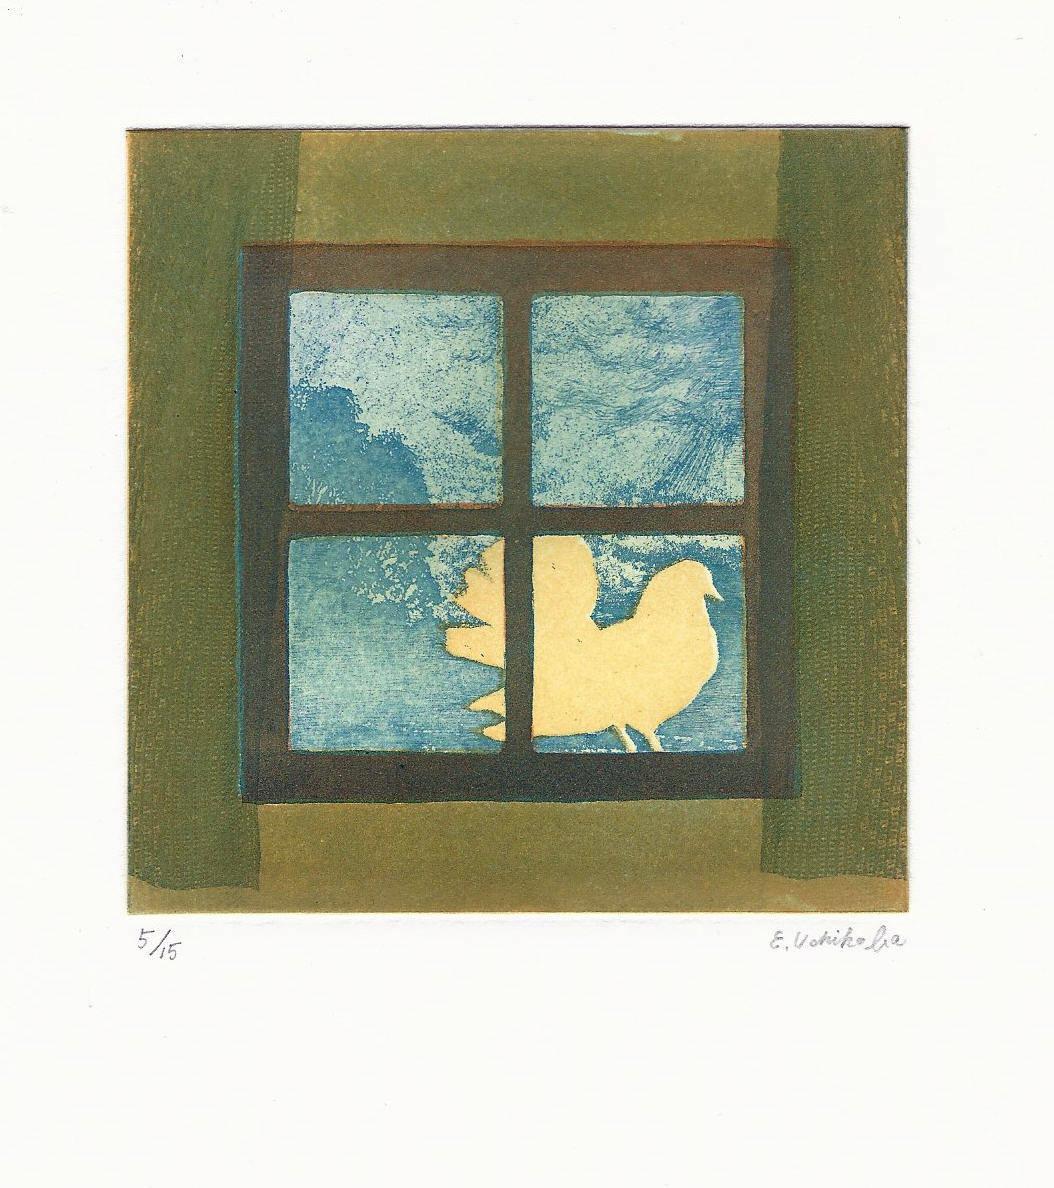 Eiko Uchikoba | MESSAGE FROM THE SUN | etching, softground | 4x4 | 2016